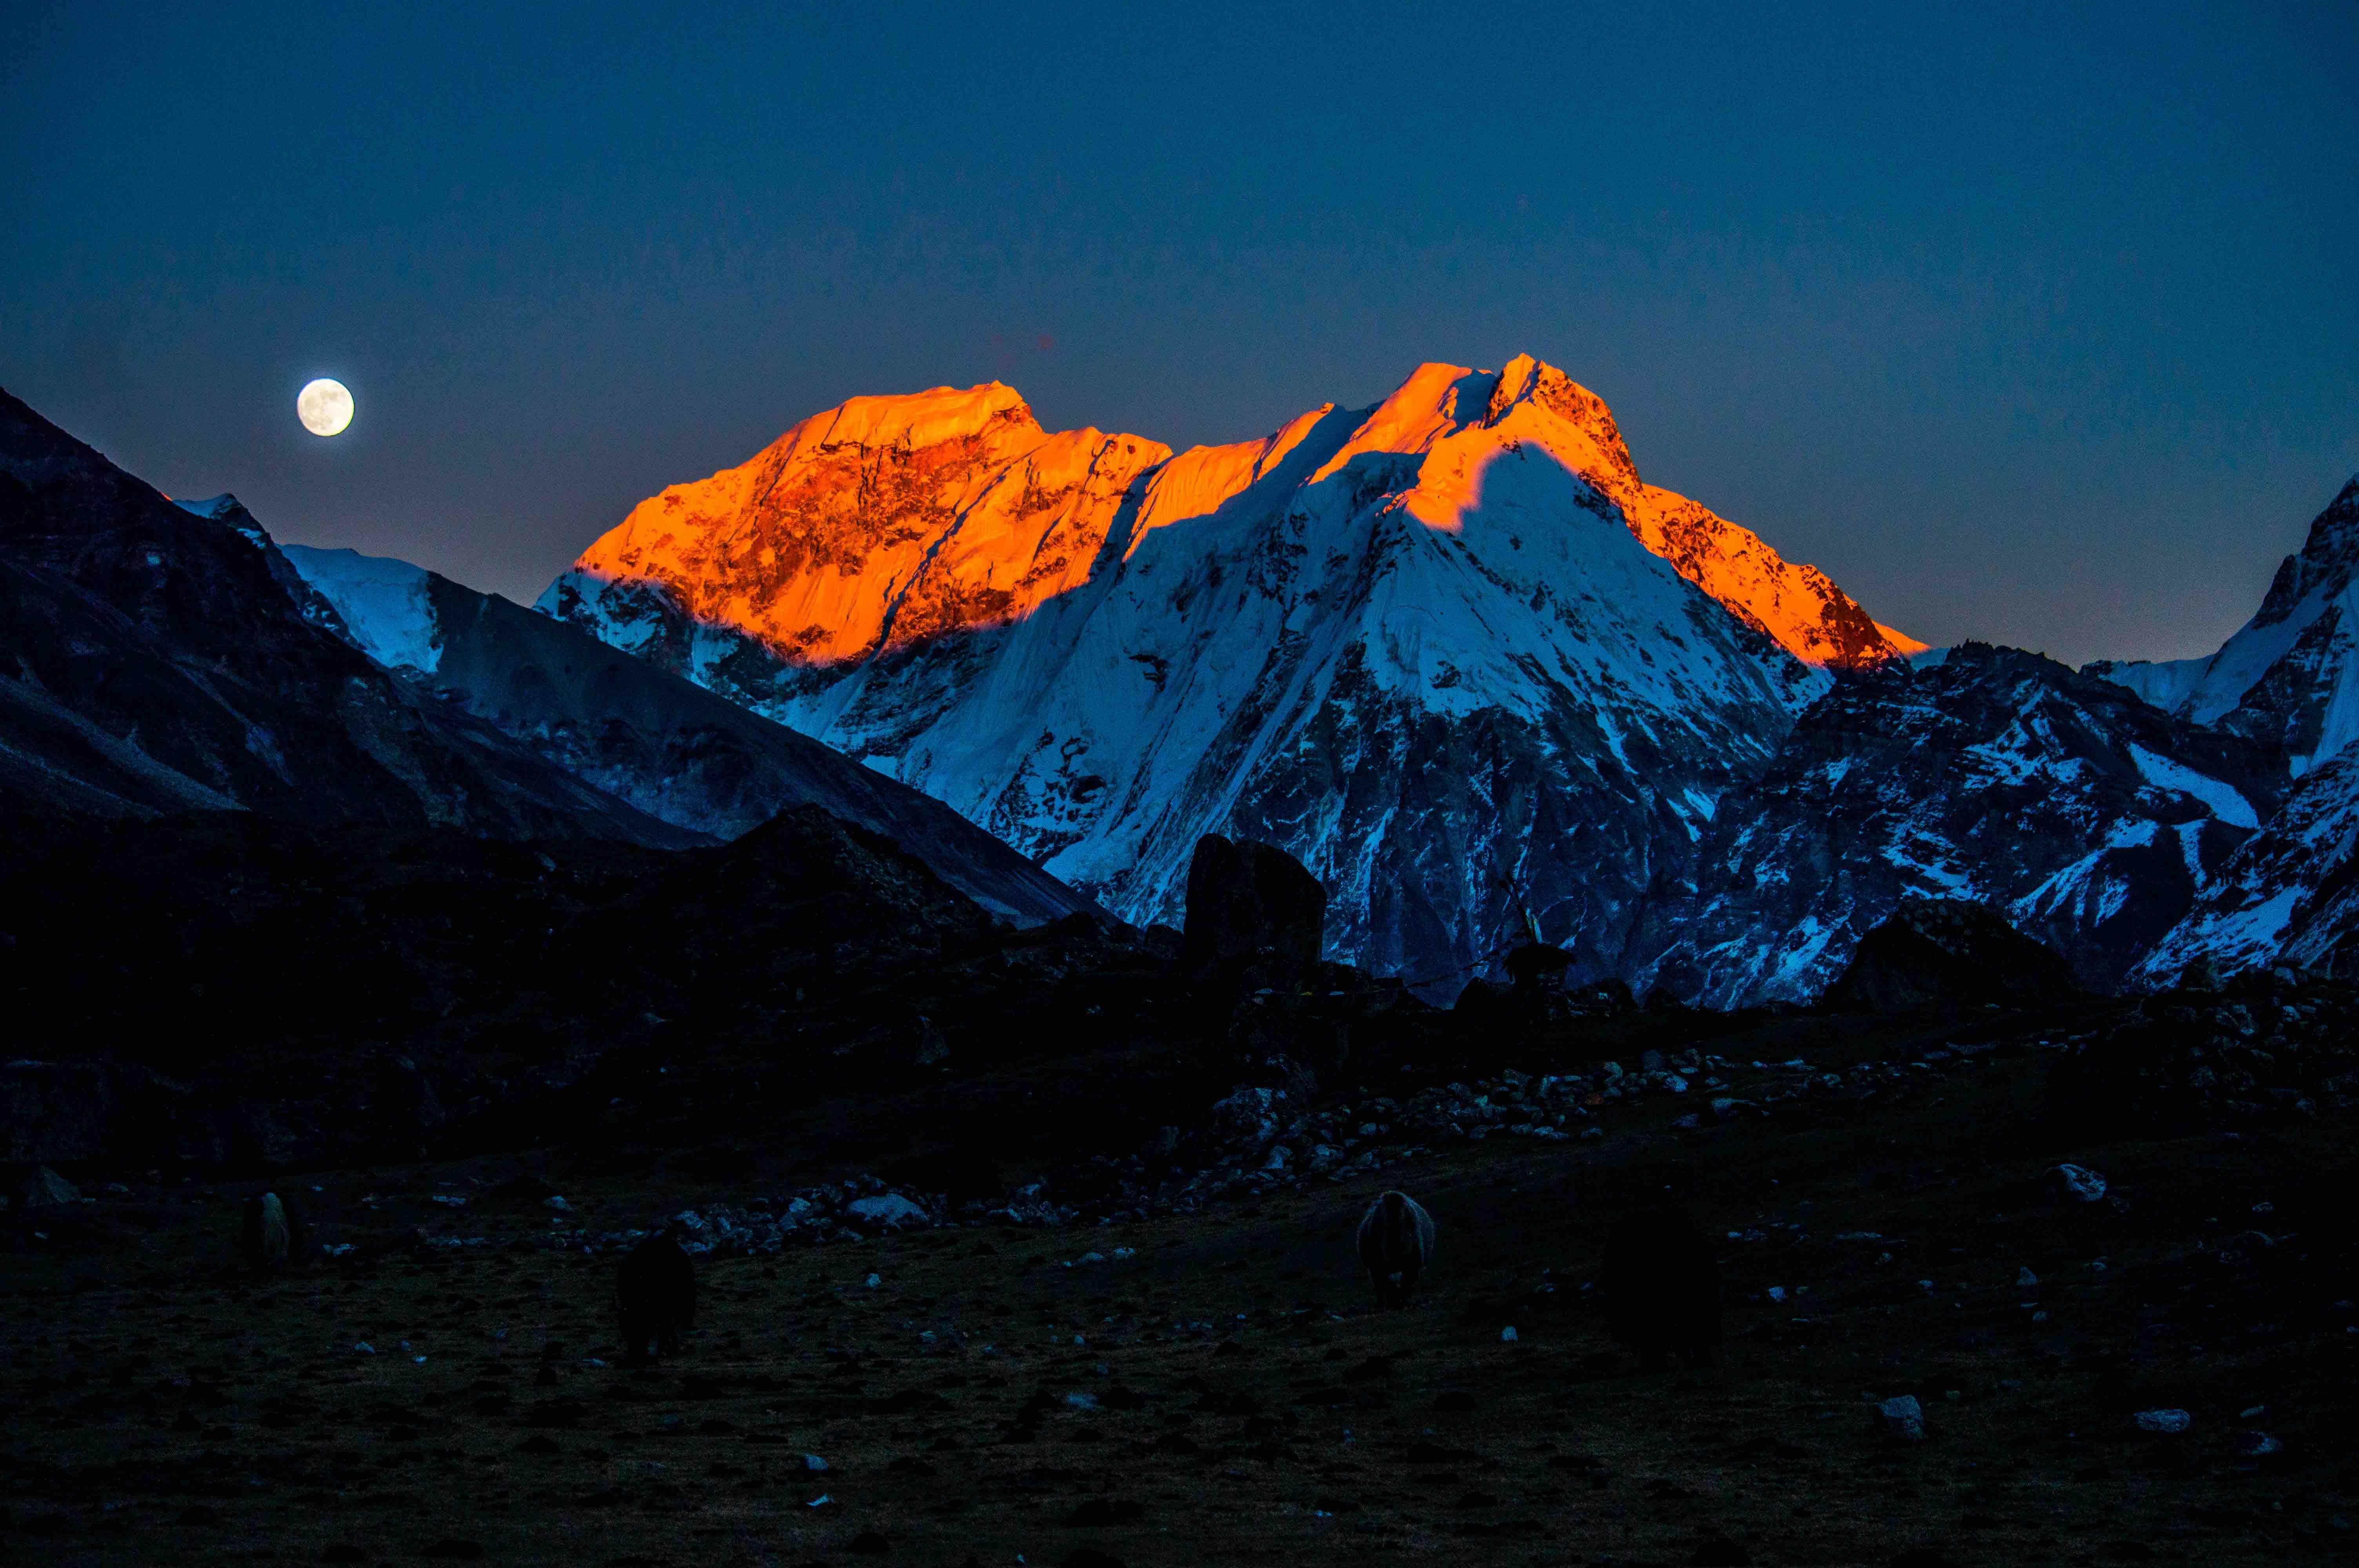 Mission Eco Trek & Expedition P(ltd), Nepal